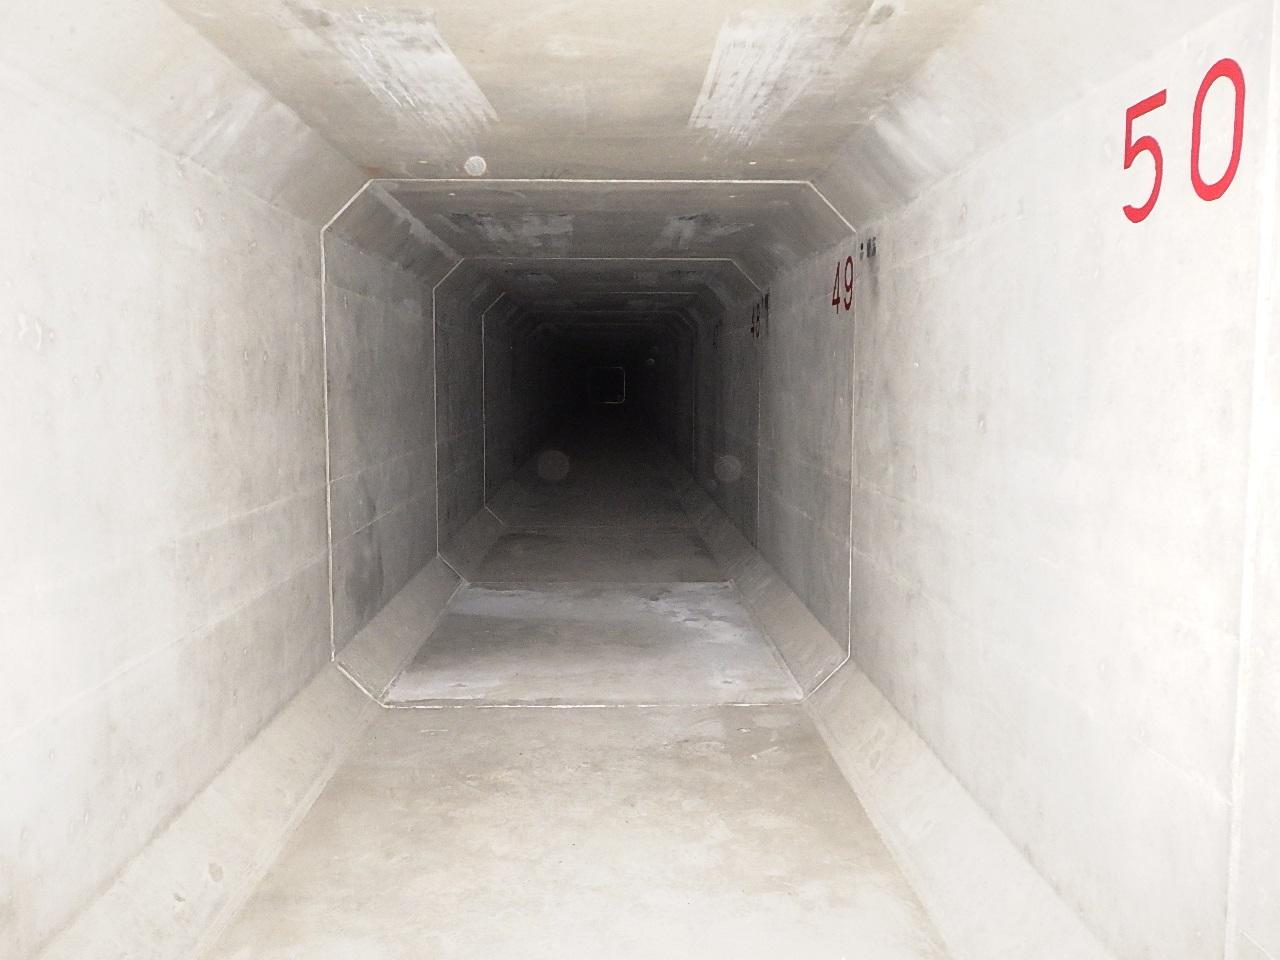 雨水管整備工事 (五十鈴二丁目ほか第225工区)